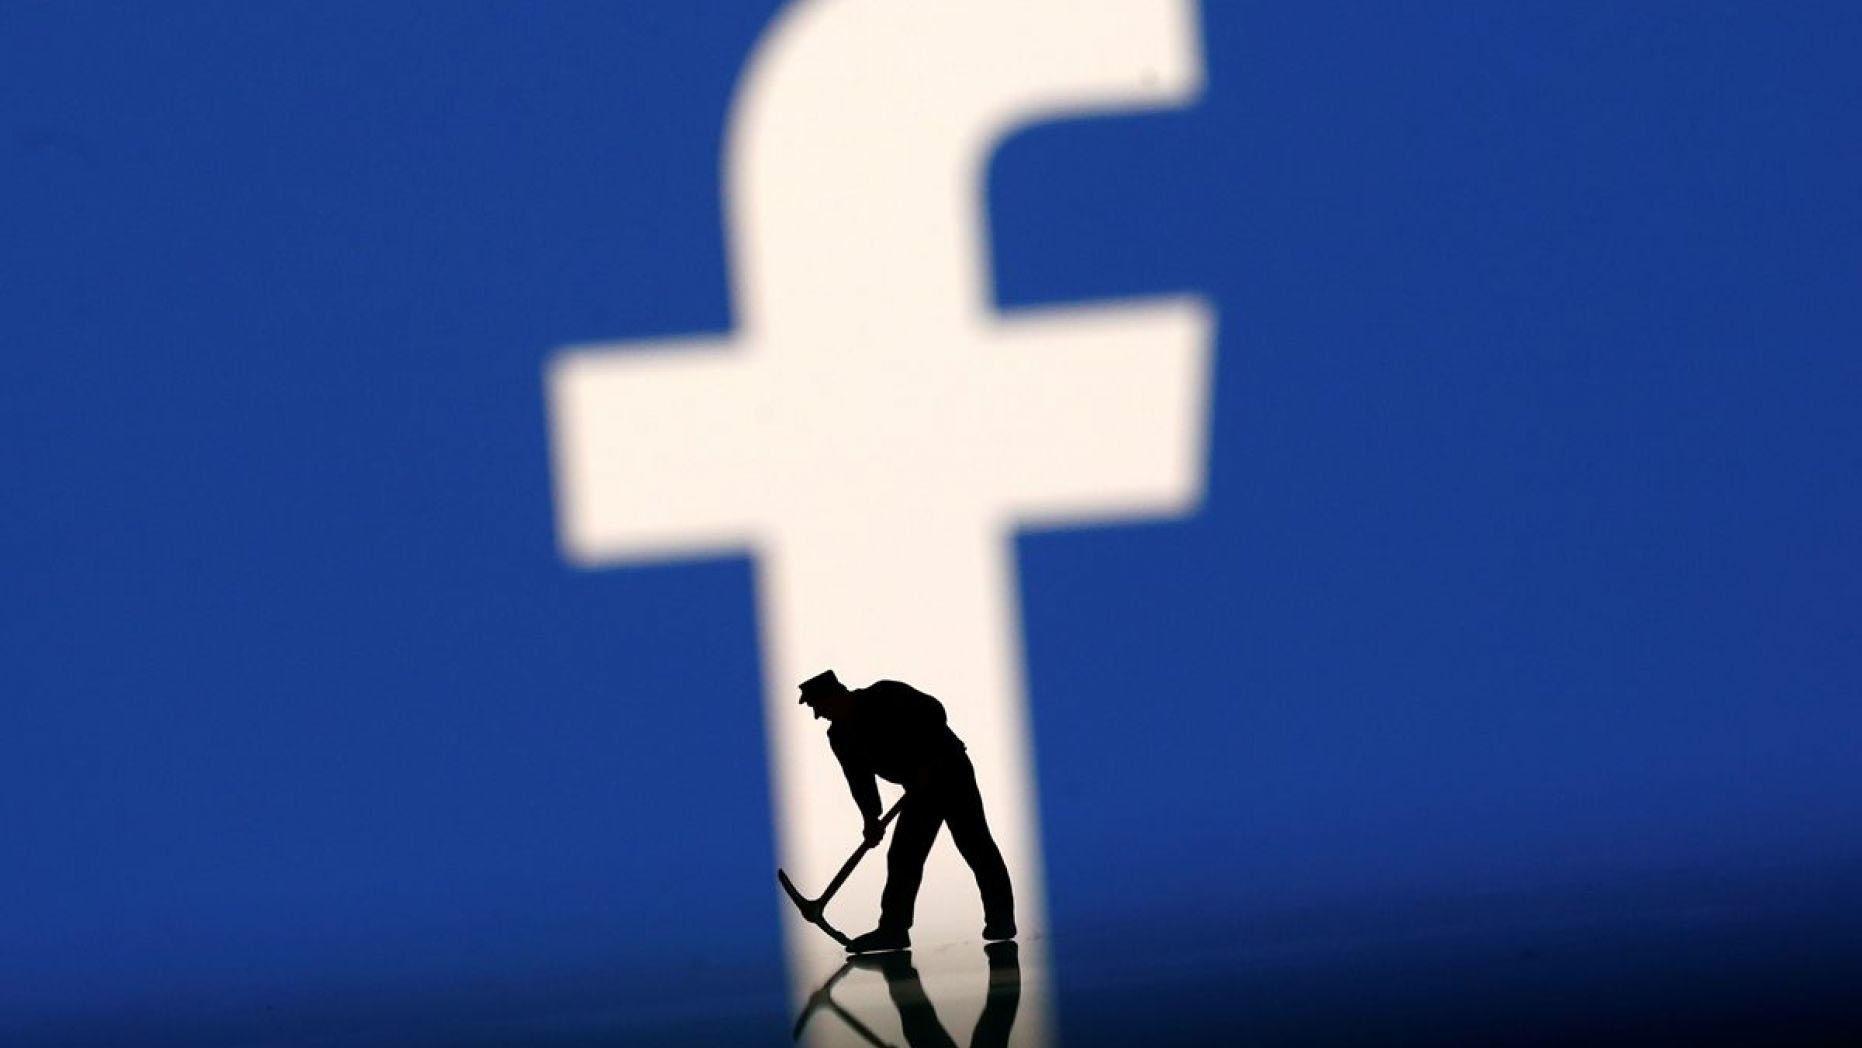 figurine in front of facebook logo